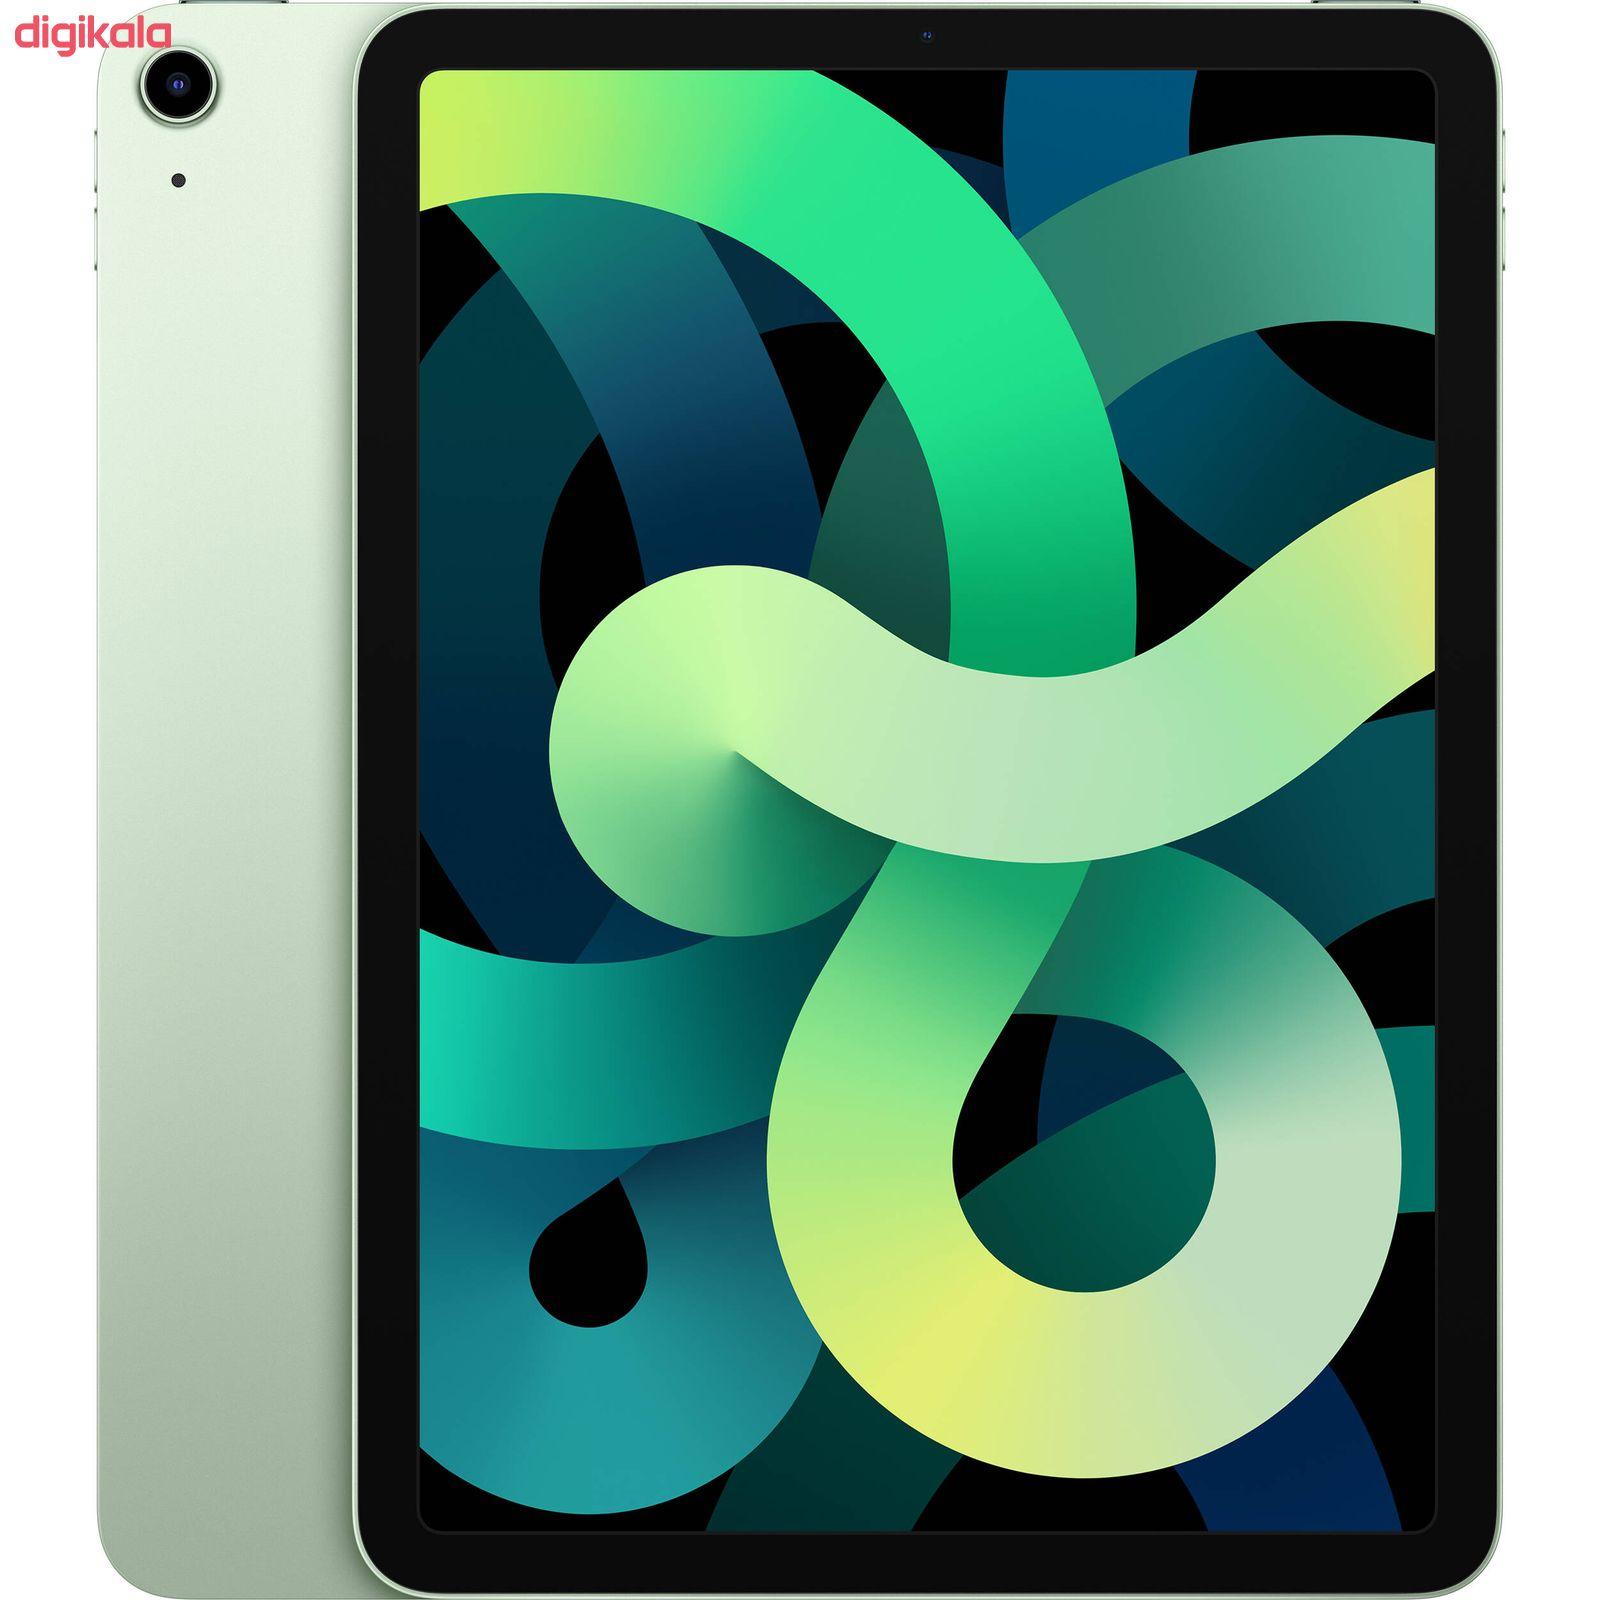 تبلت اپل مدل iPad Air 10.9 inch 2020 WiFi ظرفیت 256 گیگابایت  main 1 7